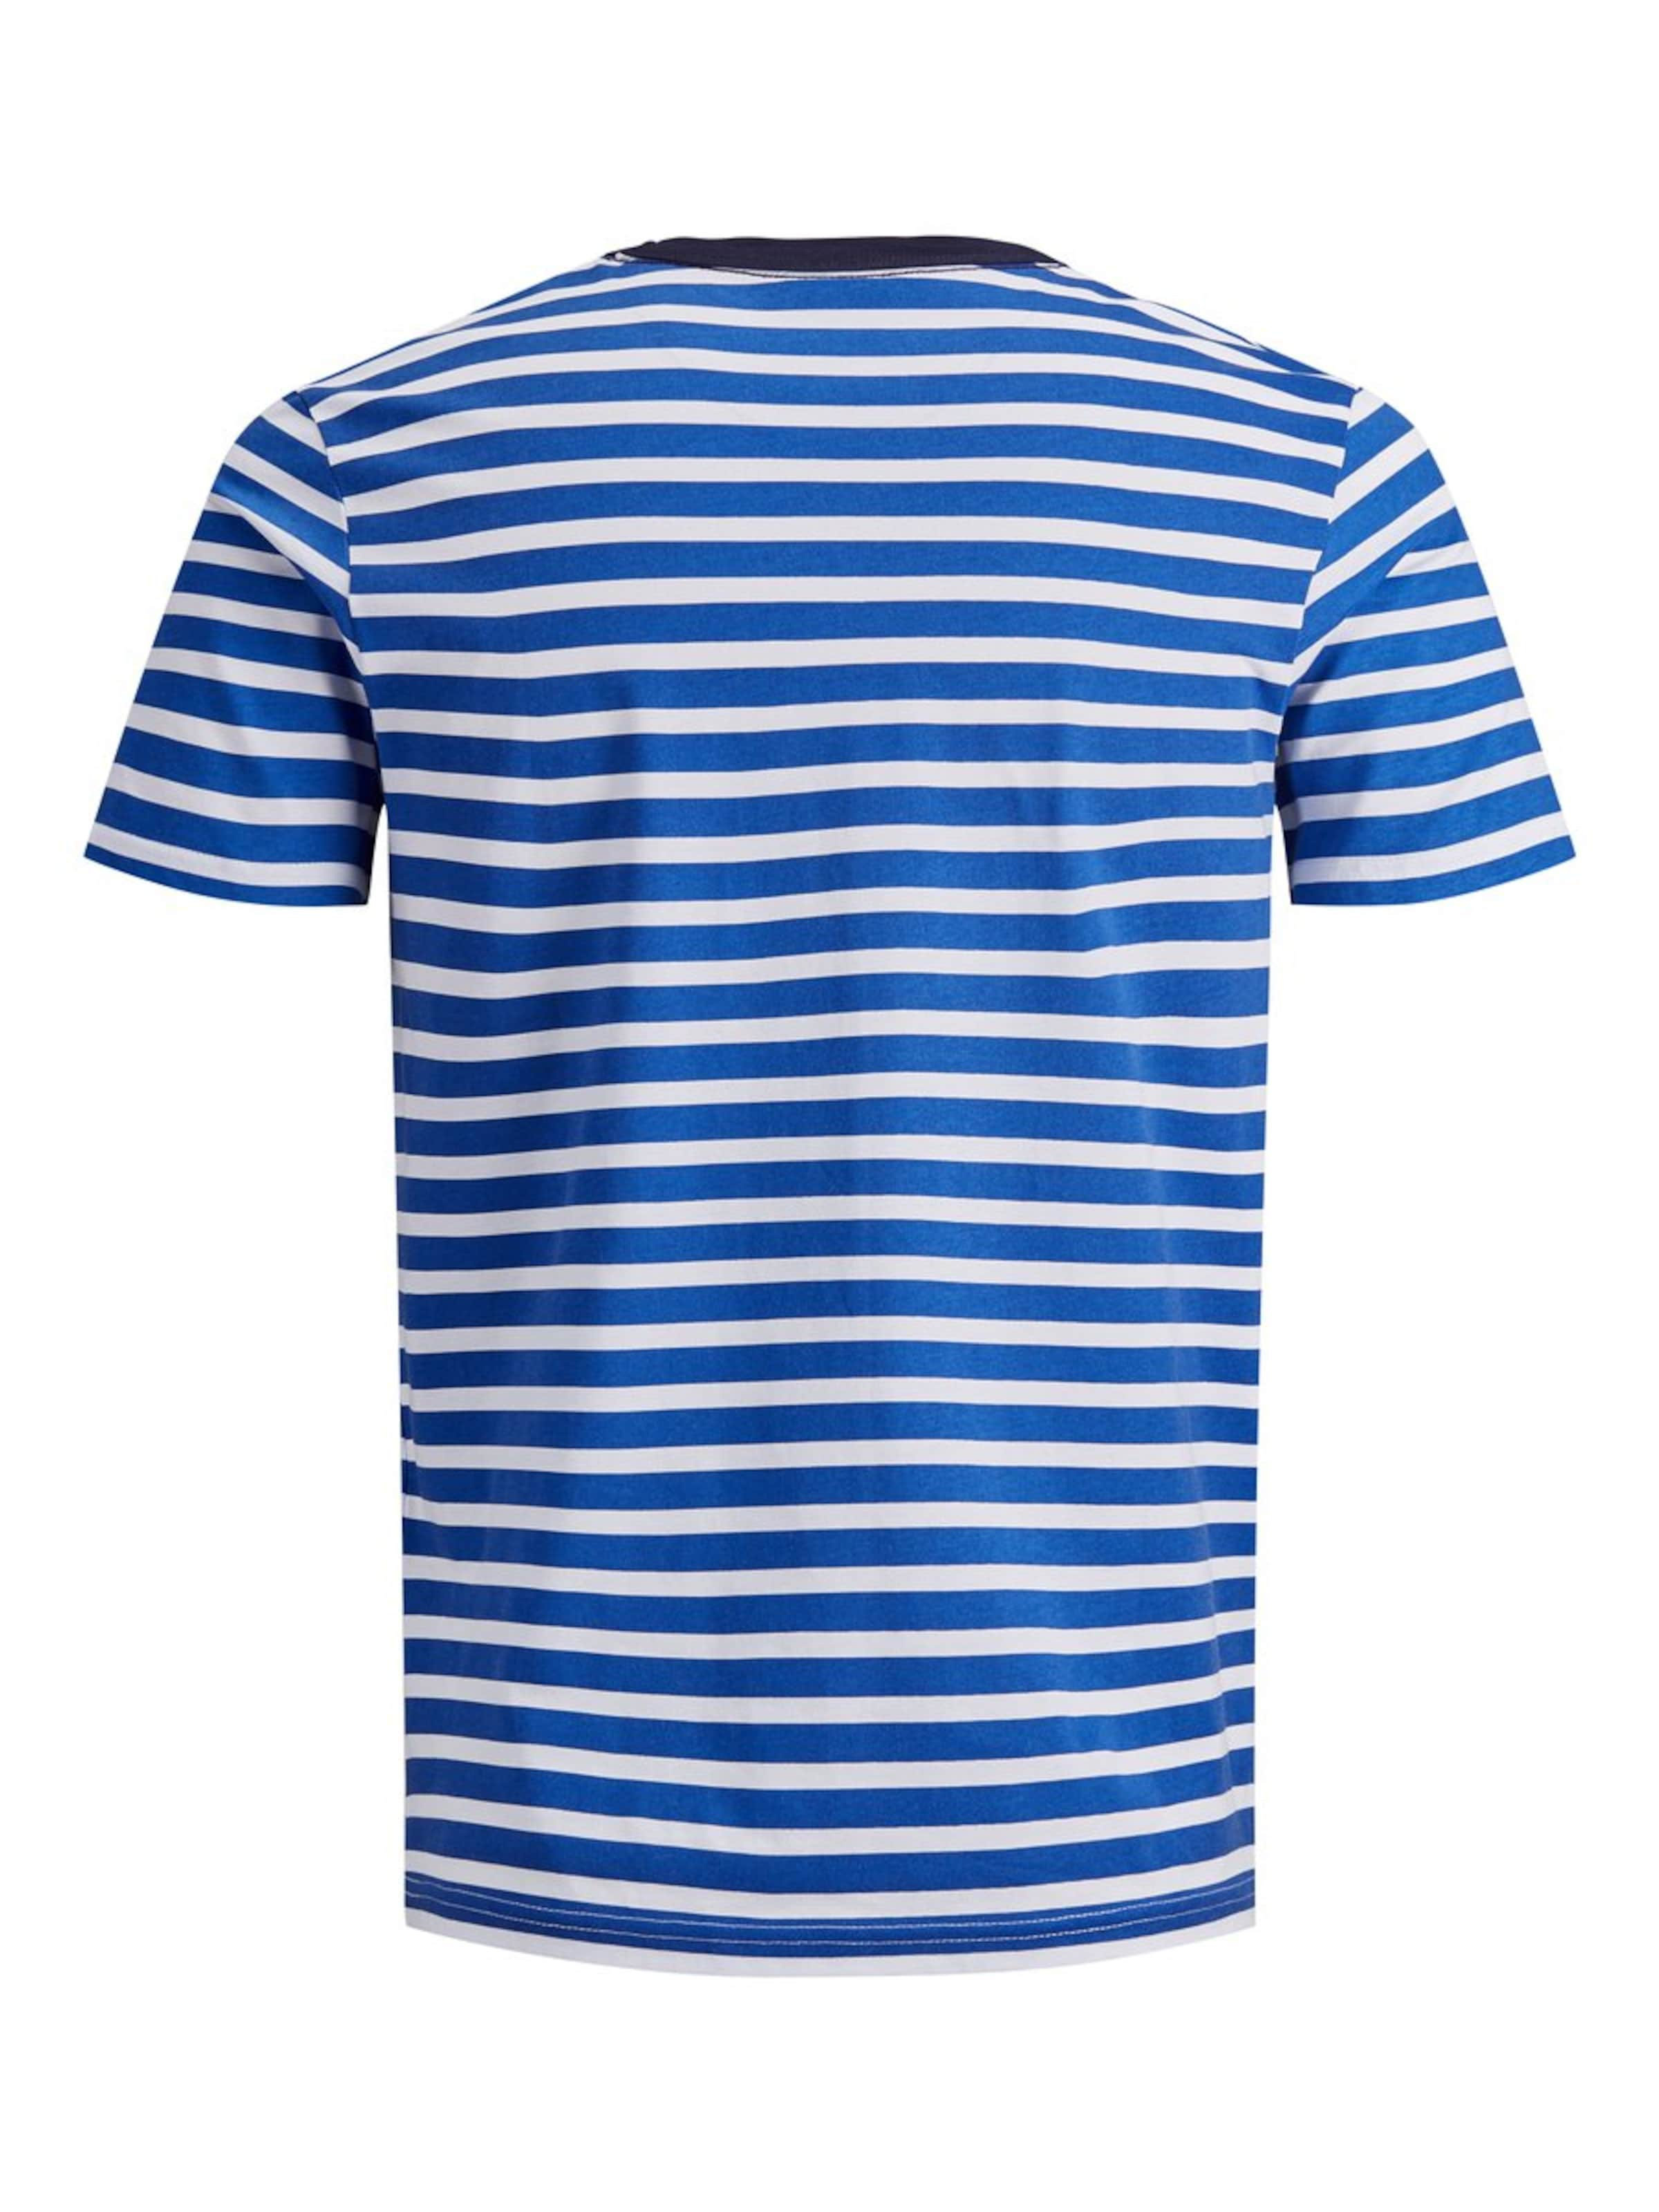 shirt BlauWeiß Jones Jackamp; In T uJ3TlF1cK